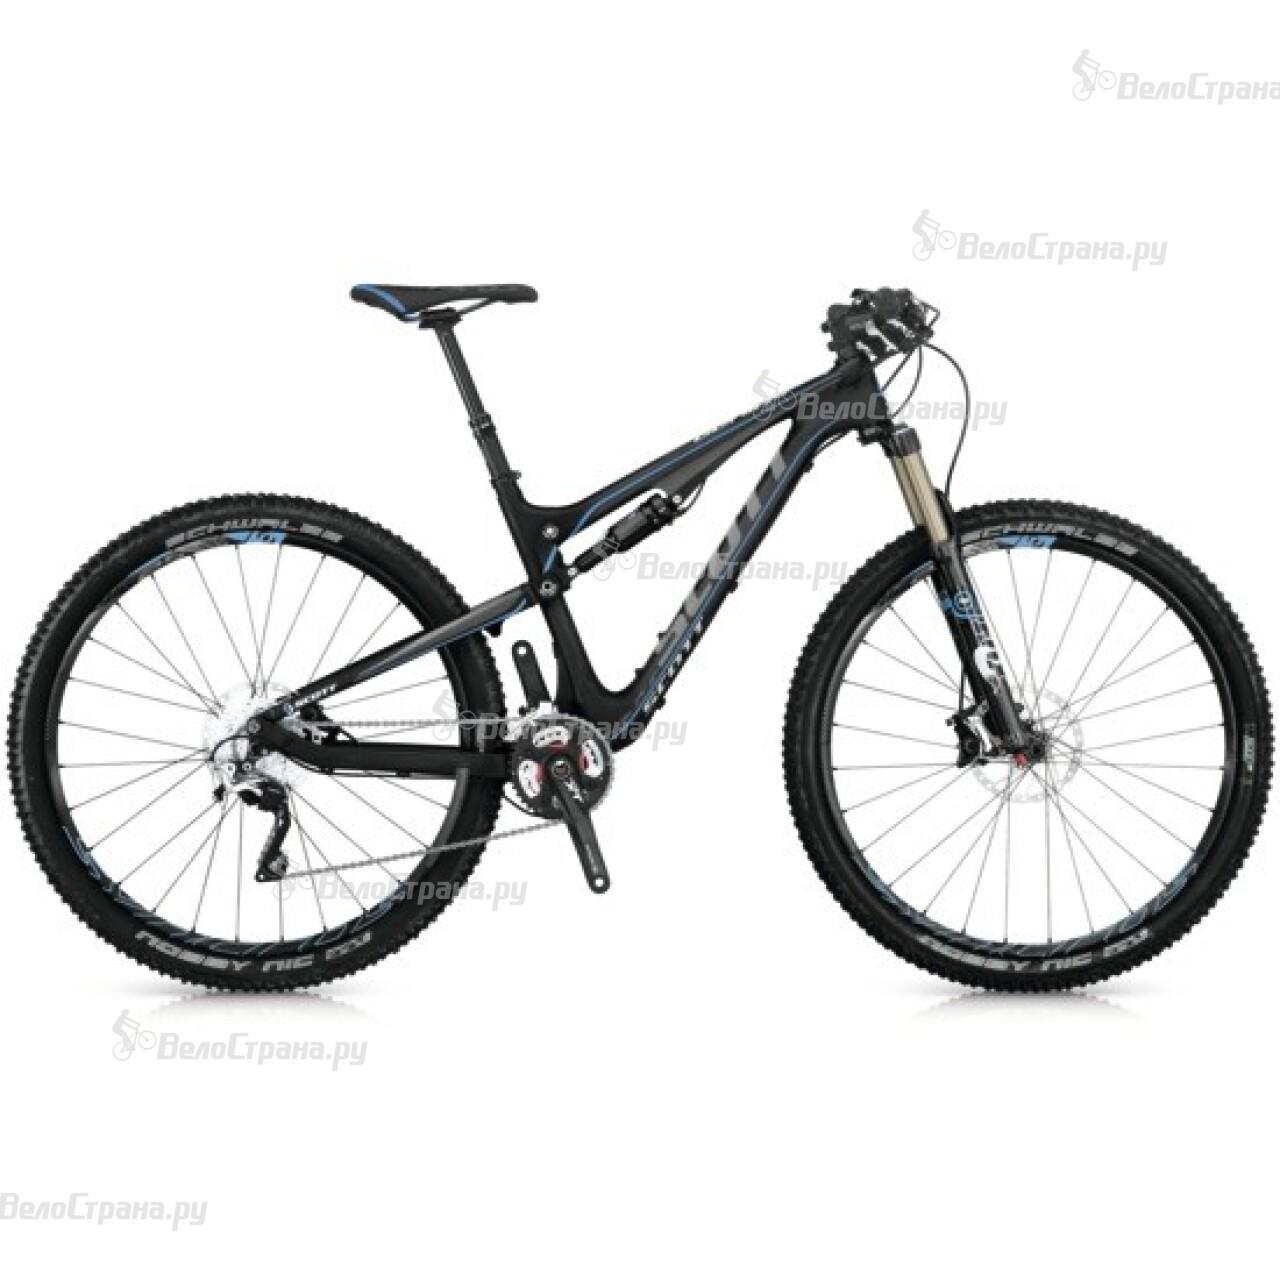 Велосипед Scott Genius 910 (2013) genius hs 300a silver